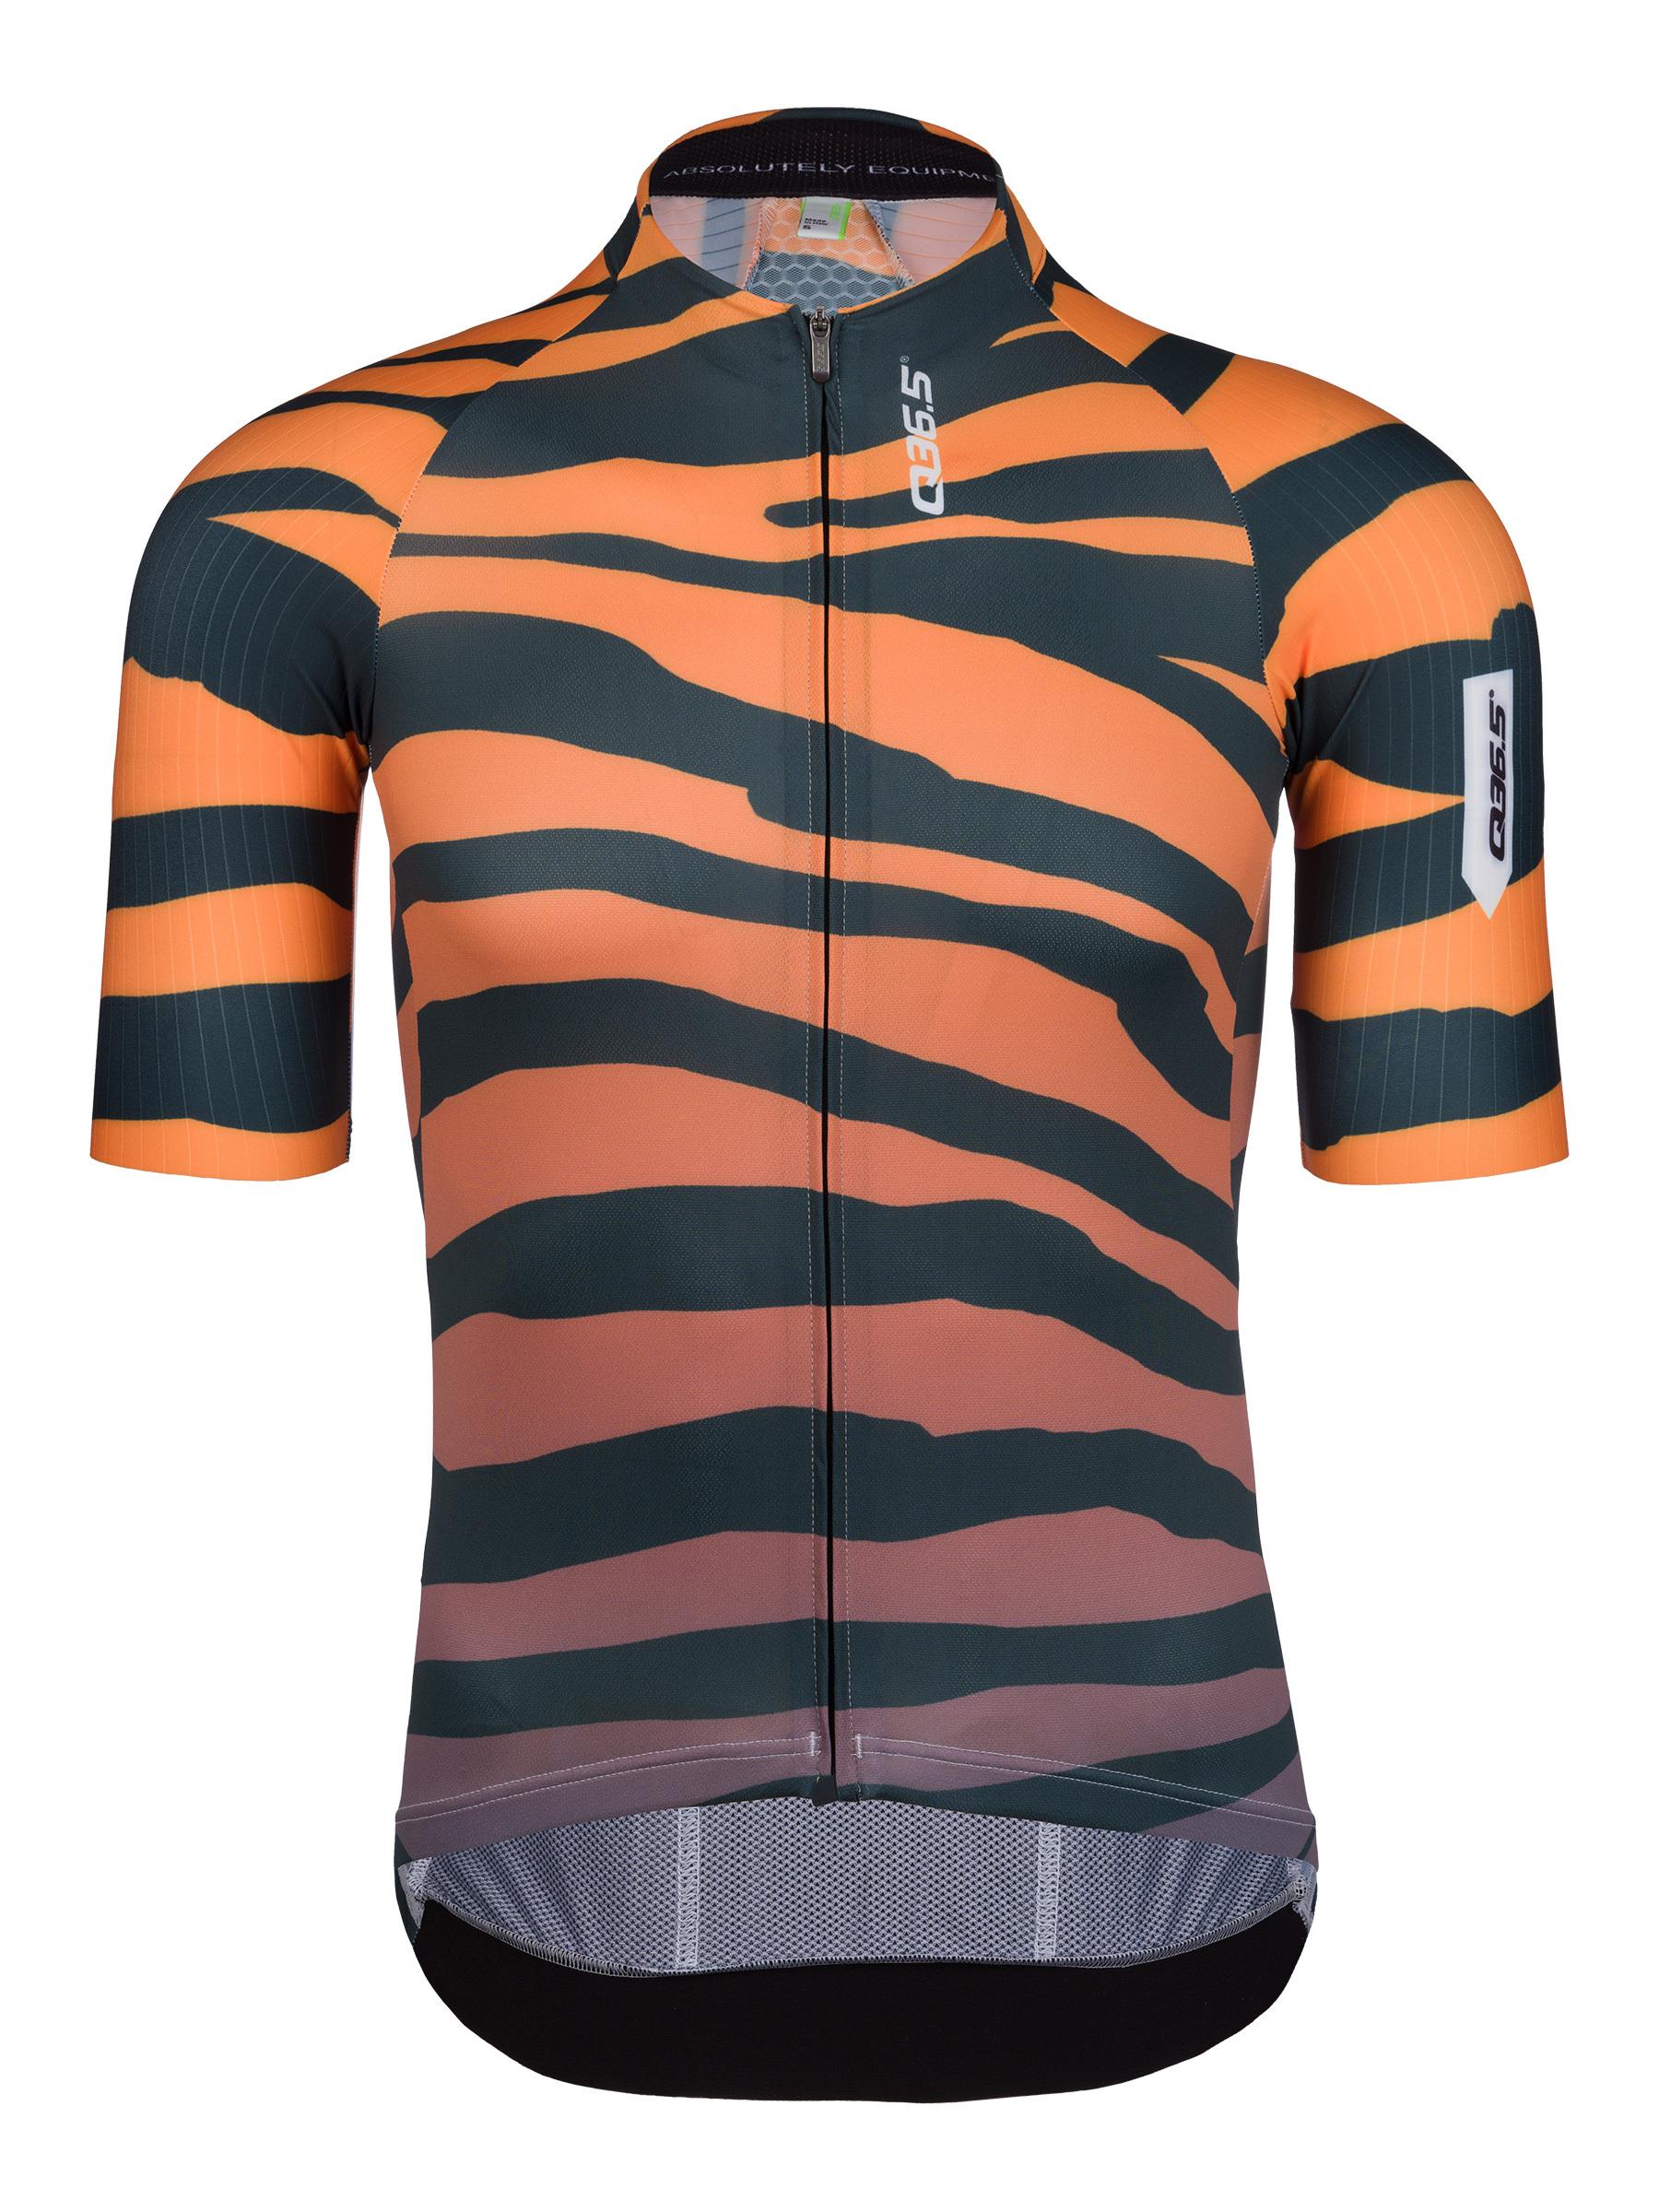 mens cycling short sleeve jersey r2 tiger orange